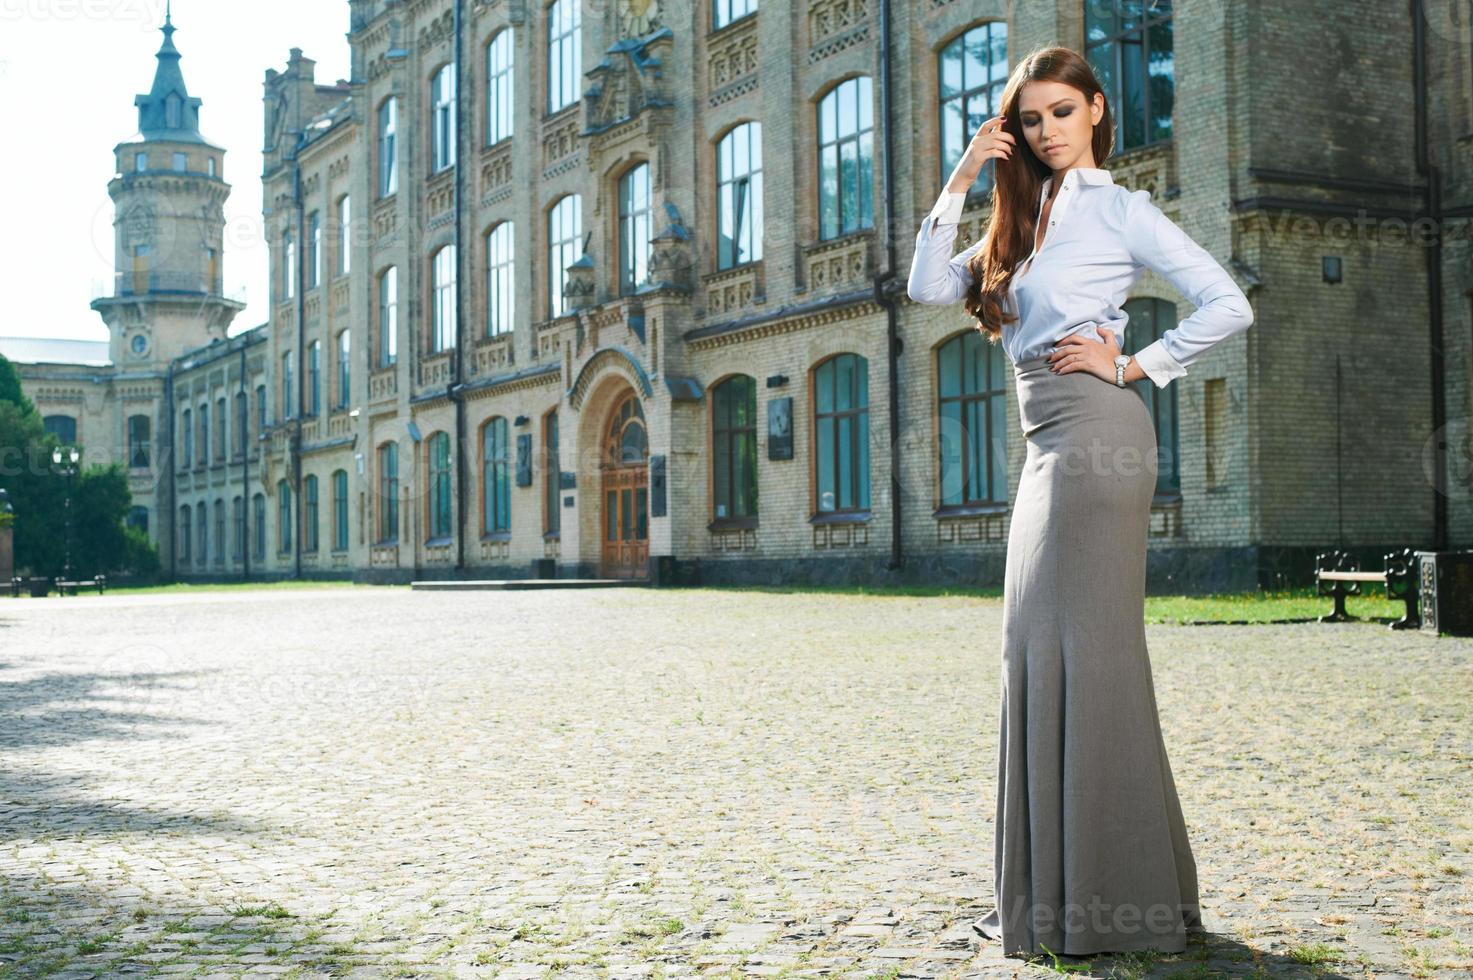 jovem mulher com roupa formal foto